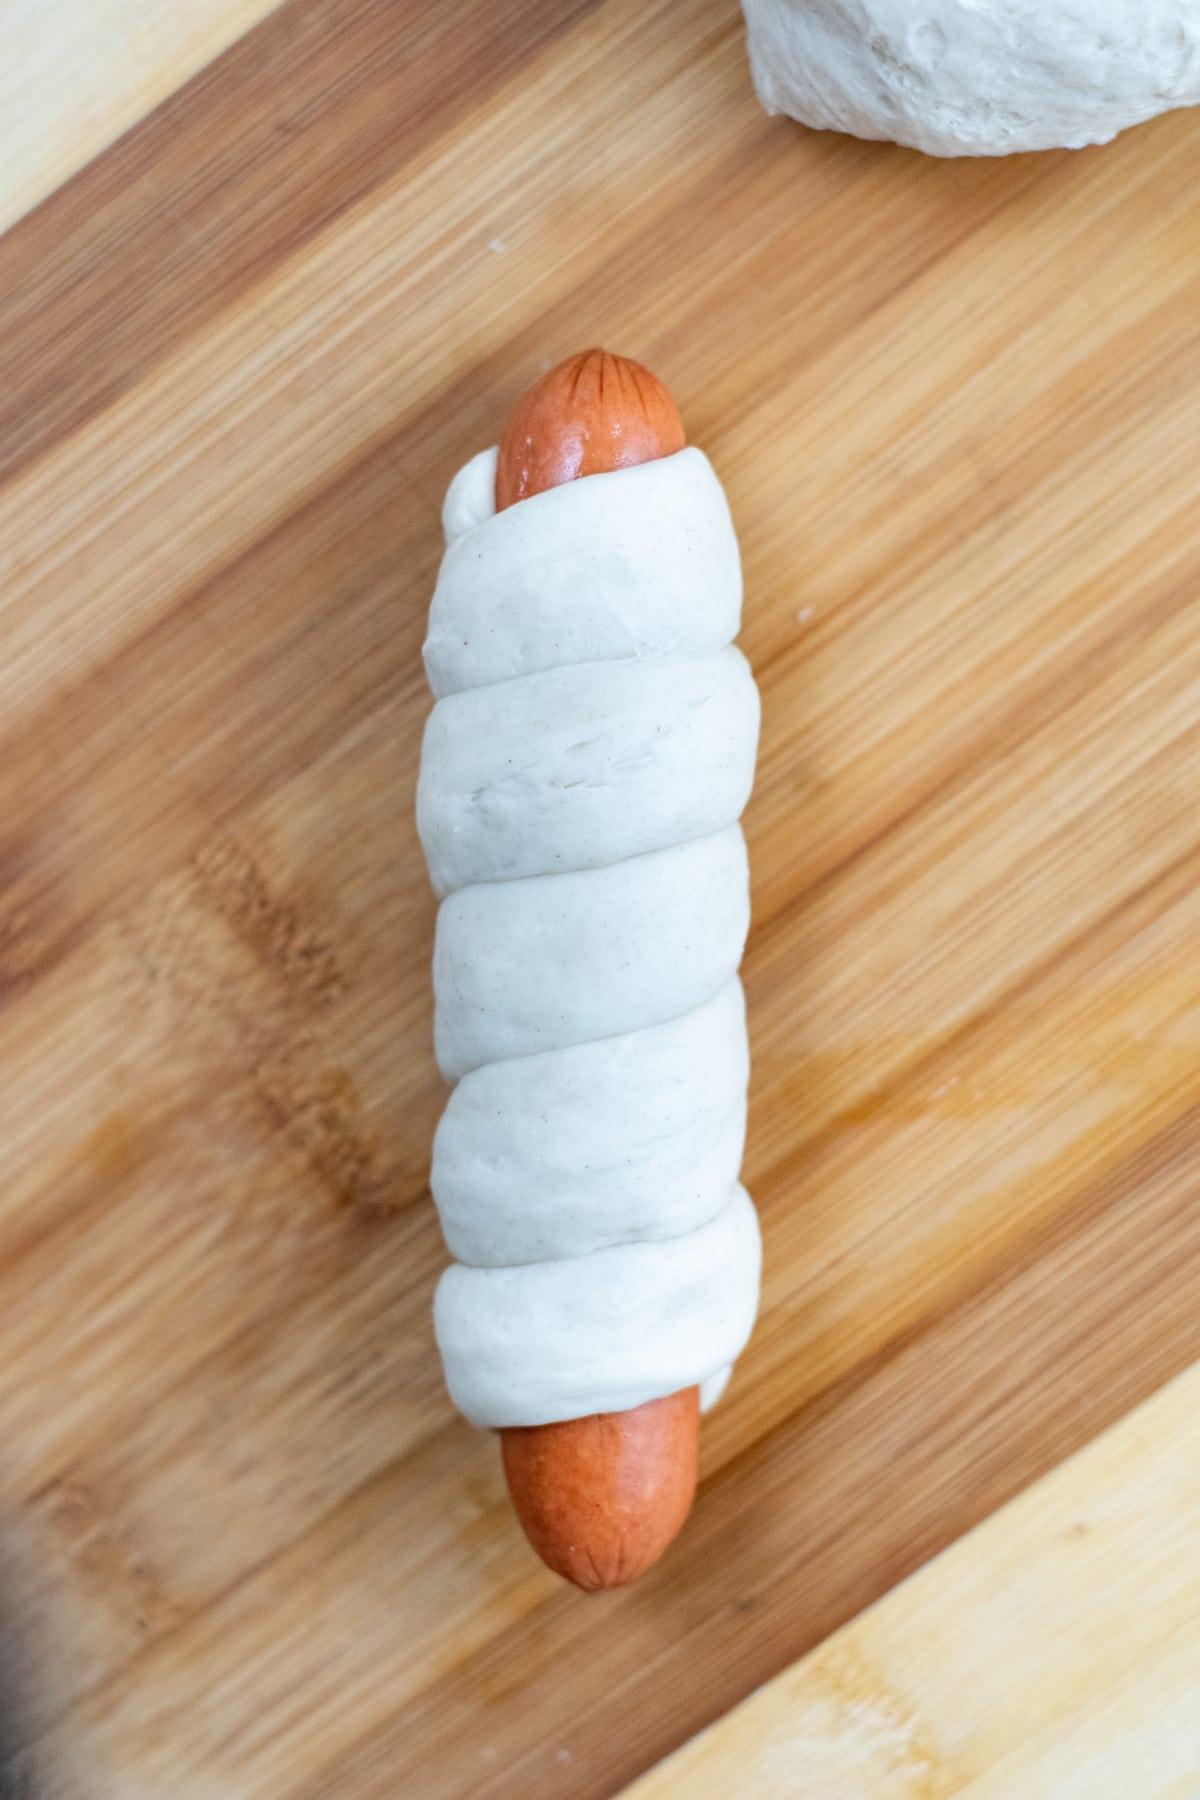 Pretzel wrapped in dough